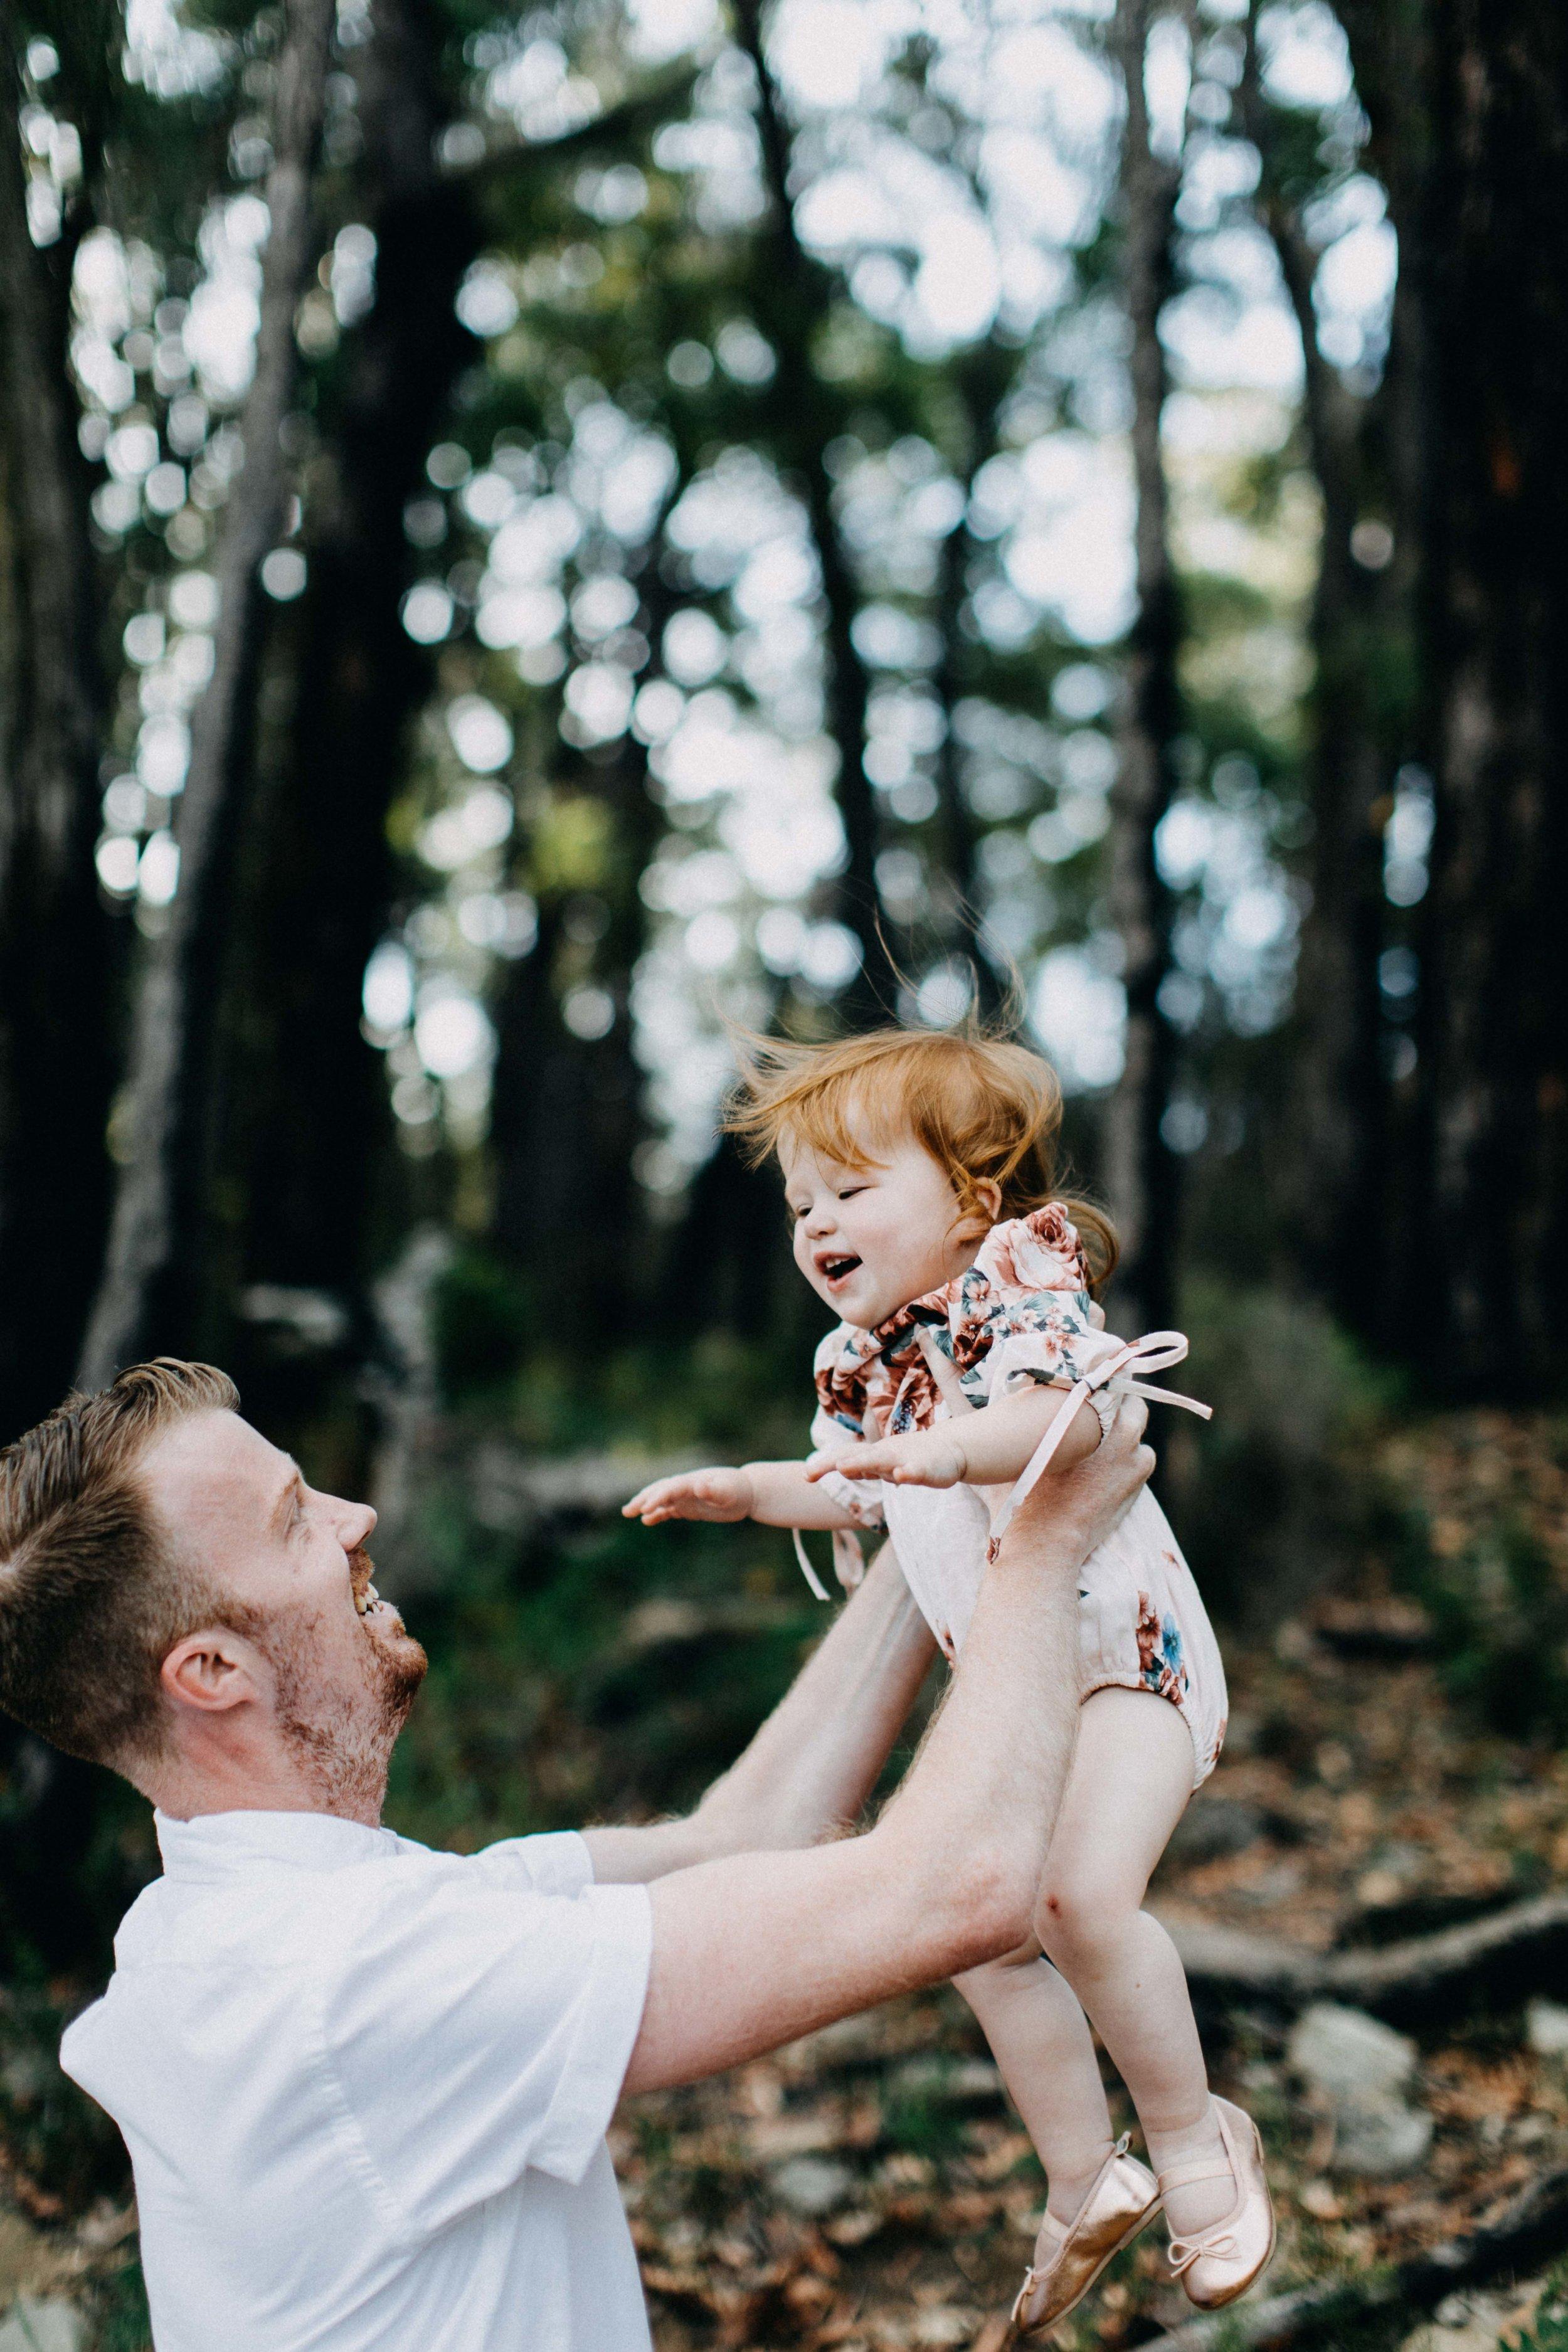 southern-highlands-maternity-photography-macarthur-ruth-www.emilyobrienphotography.net-31.jpg